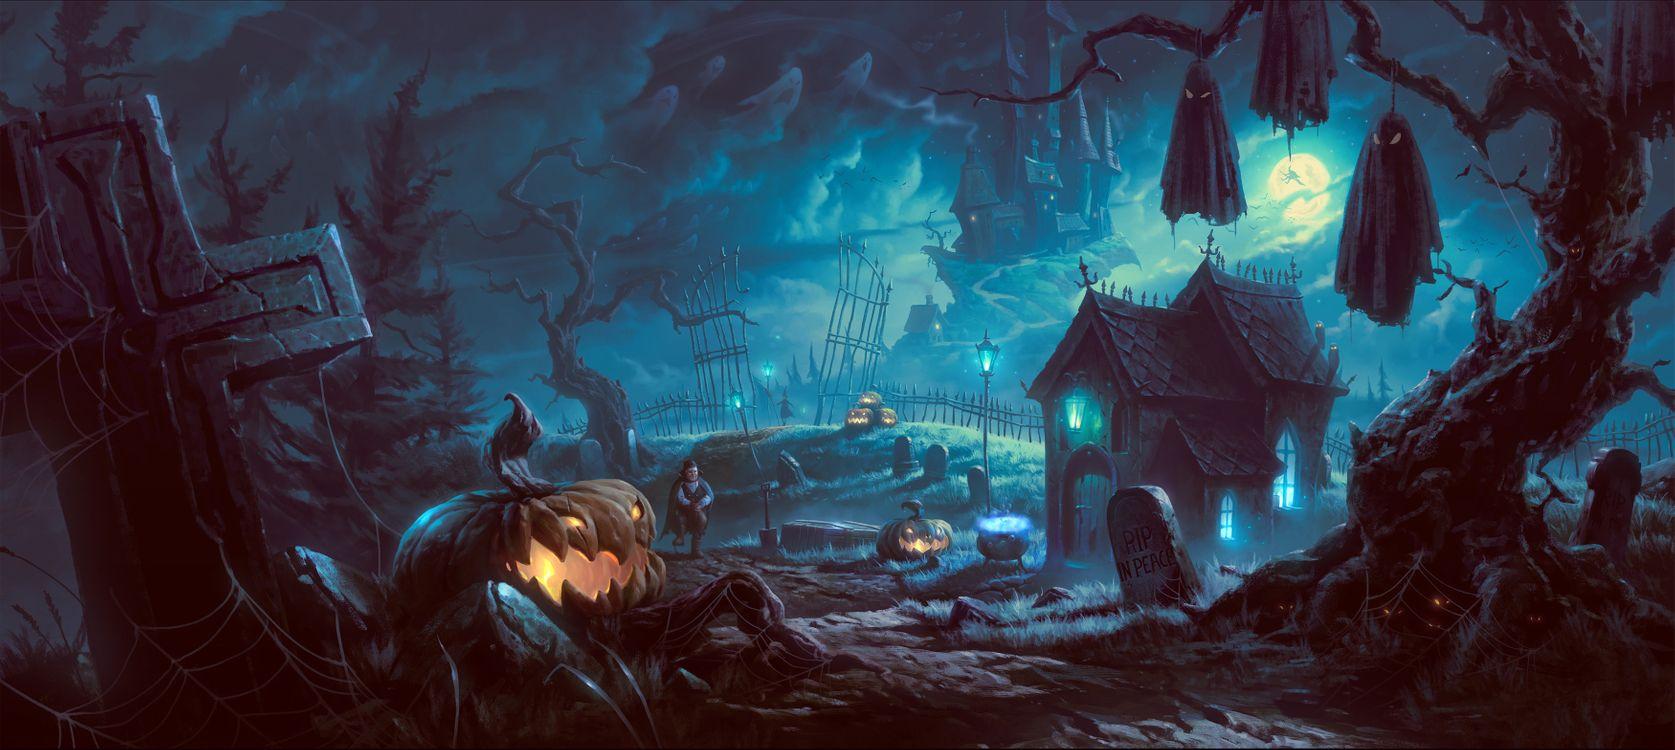 Фото бесплатно Хэллоуин, halloween, фантастика, фэнтези, фантасмагория, панорама, фантастика